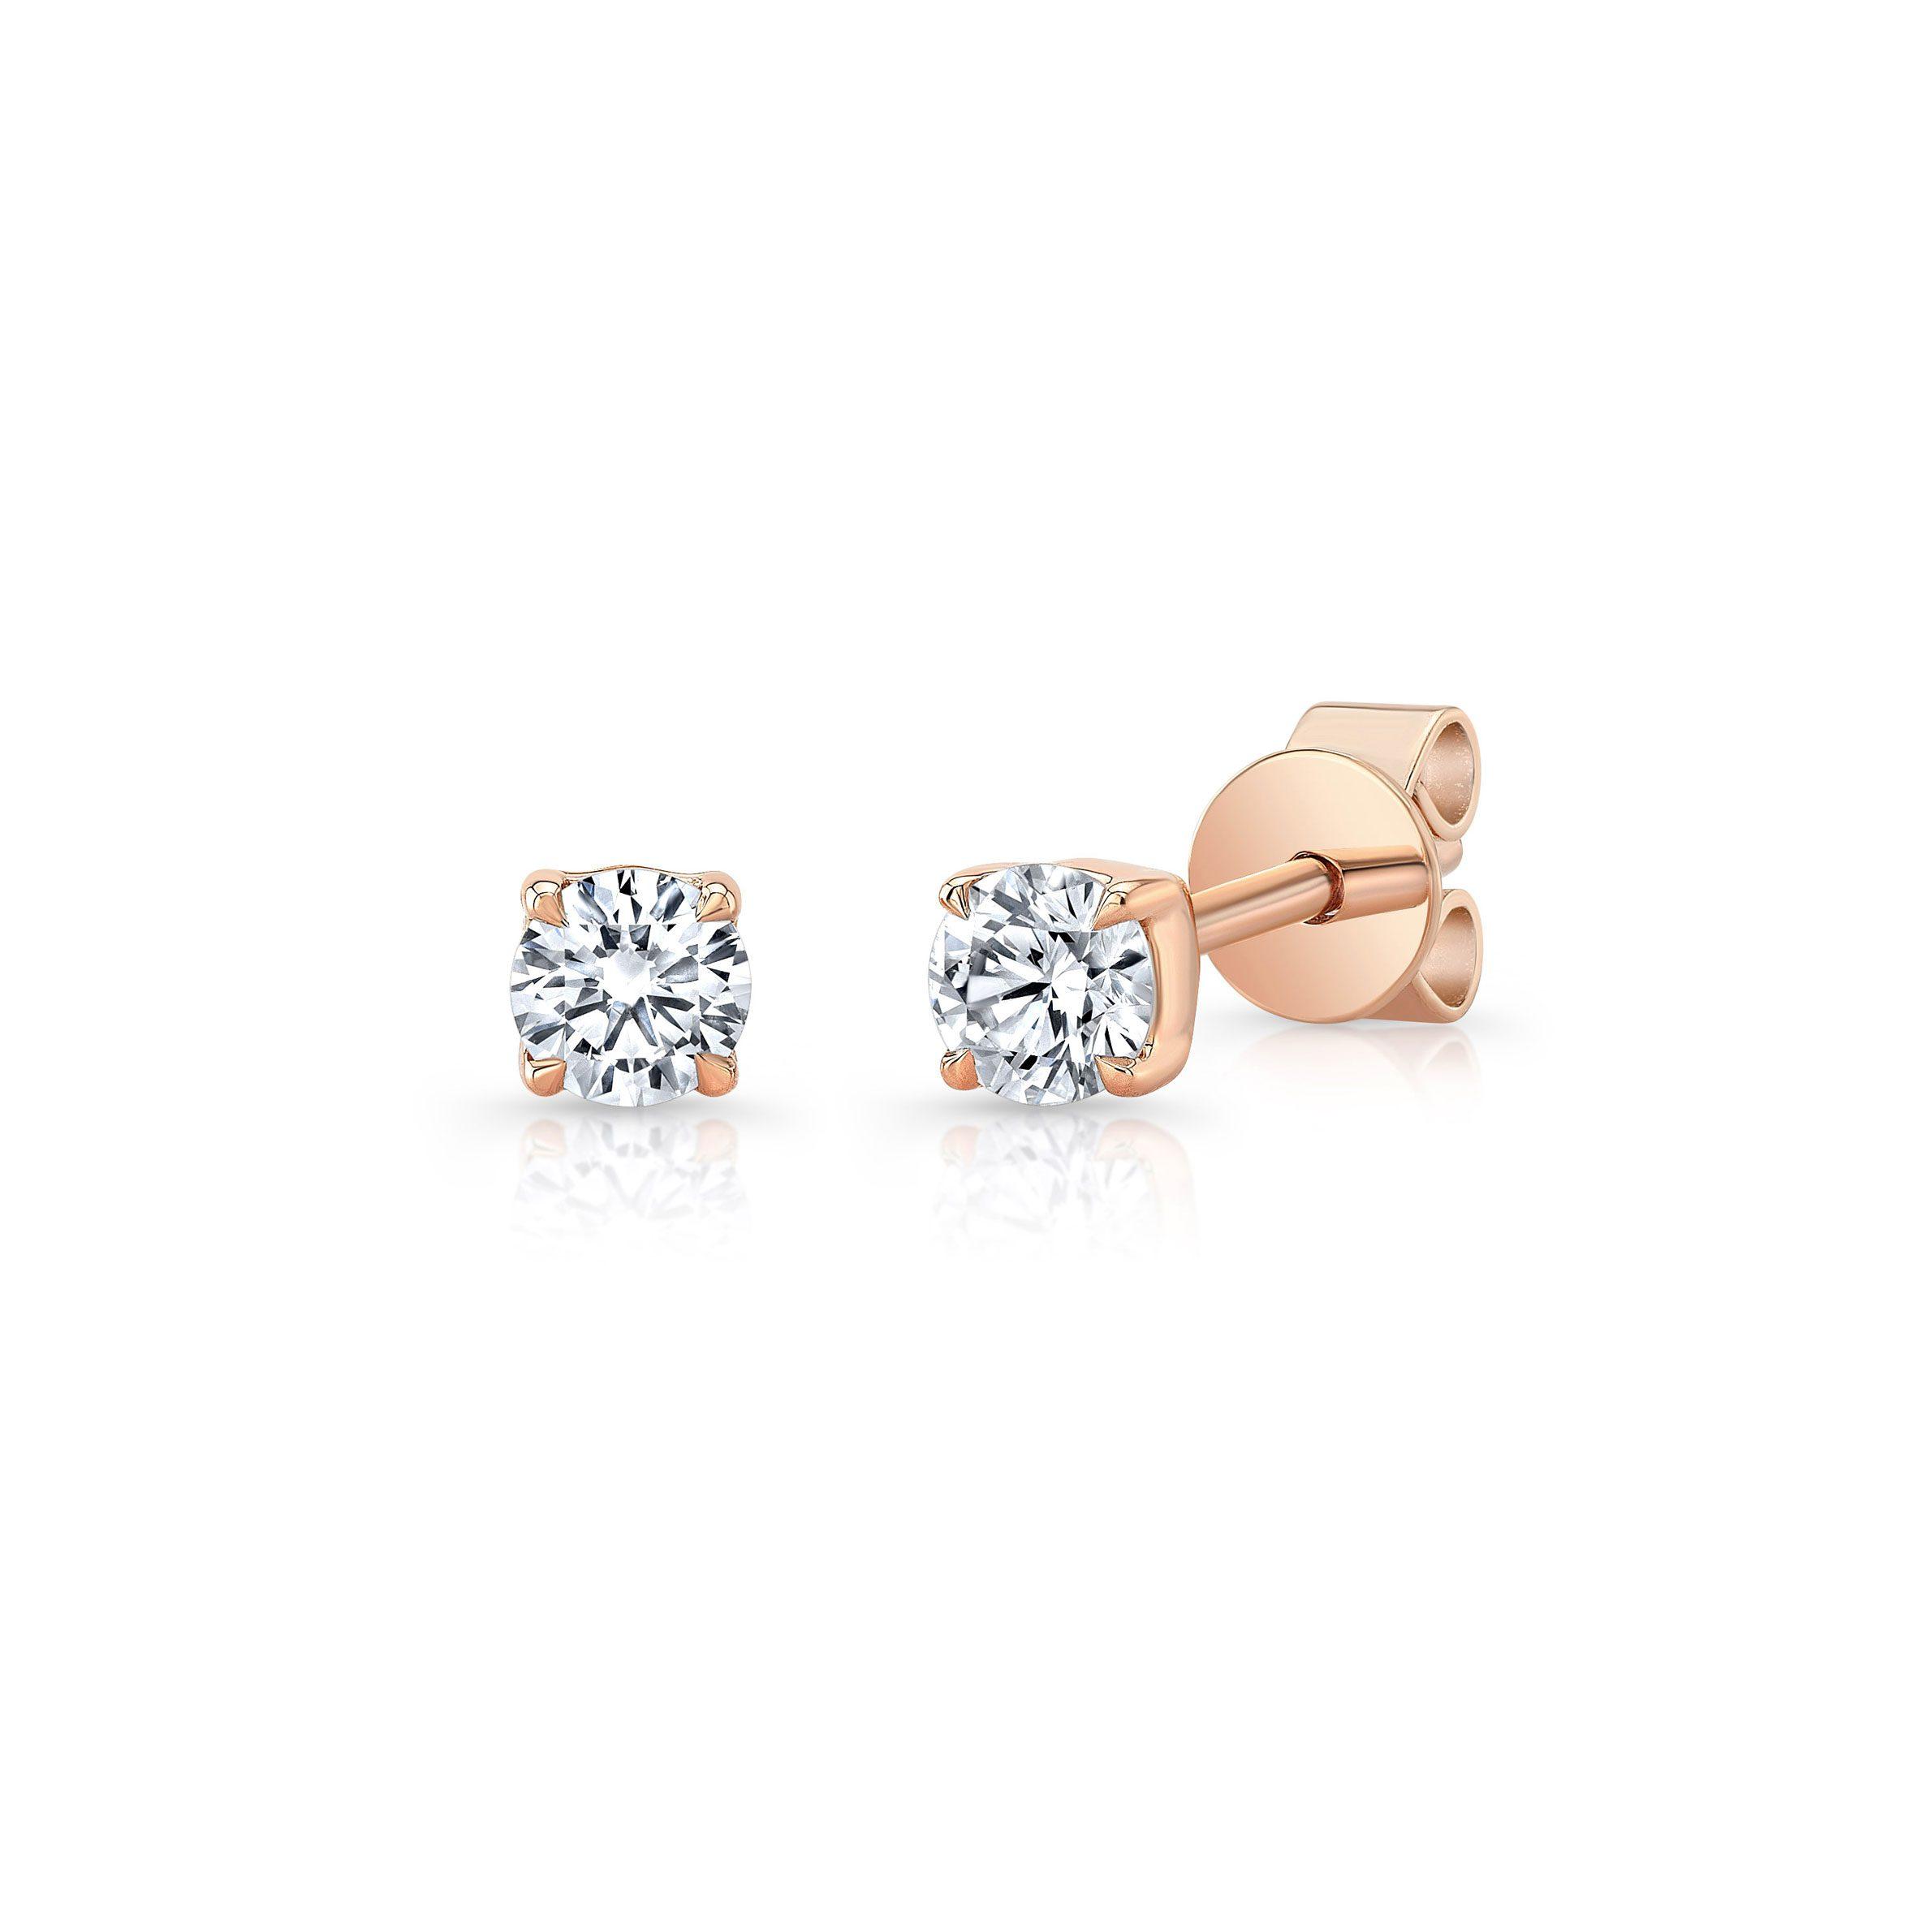 La Petite Round Brilliant Diamond Stud Earrings in 18k Rose Gold Side View by Oui by Jean Dousset